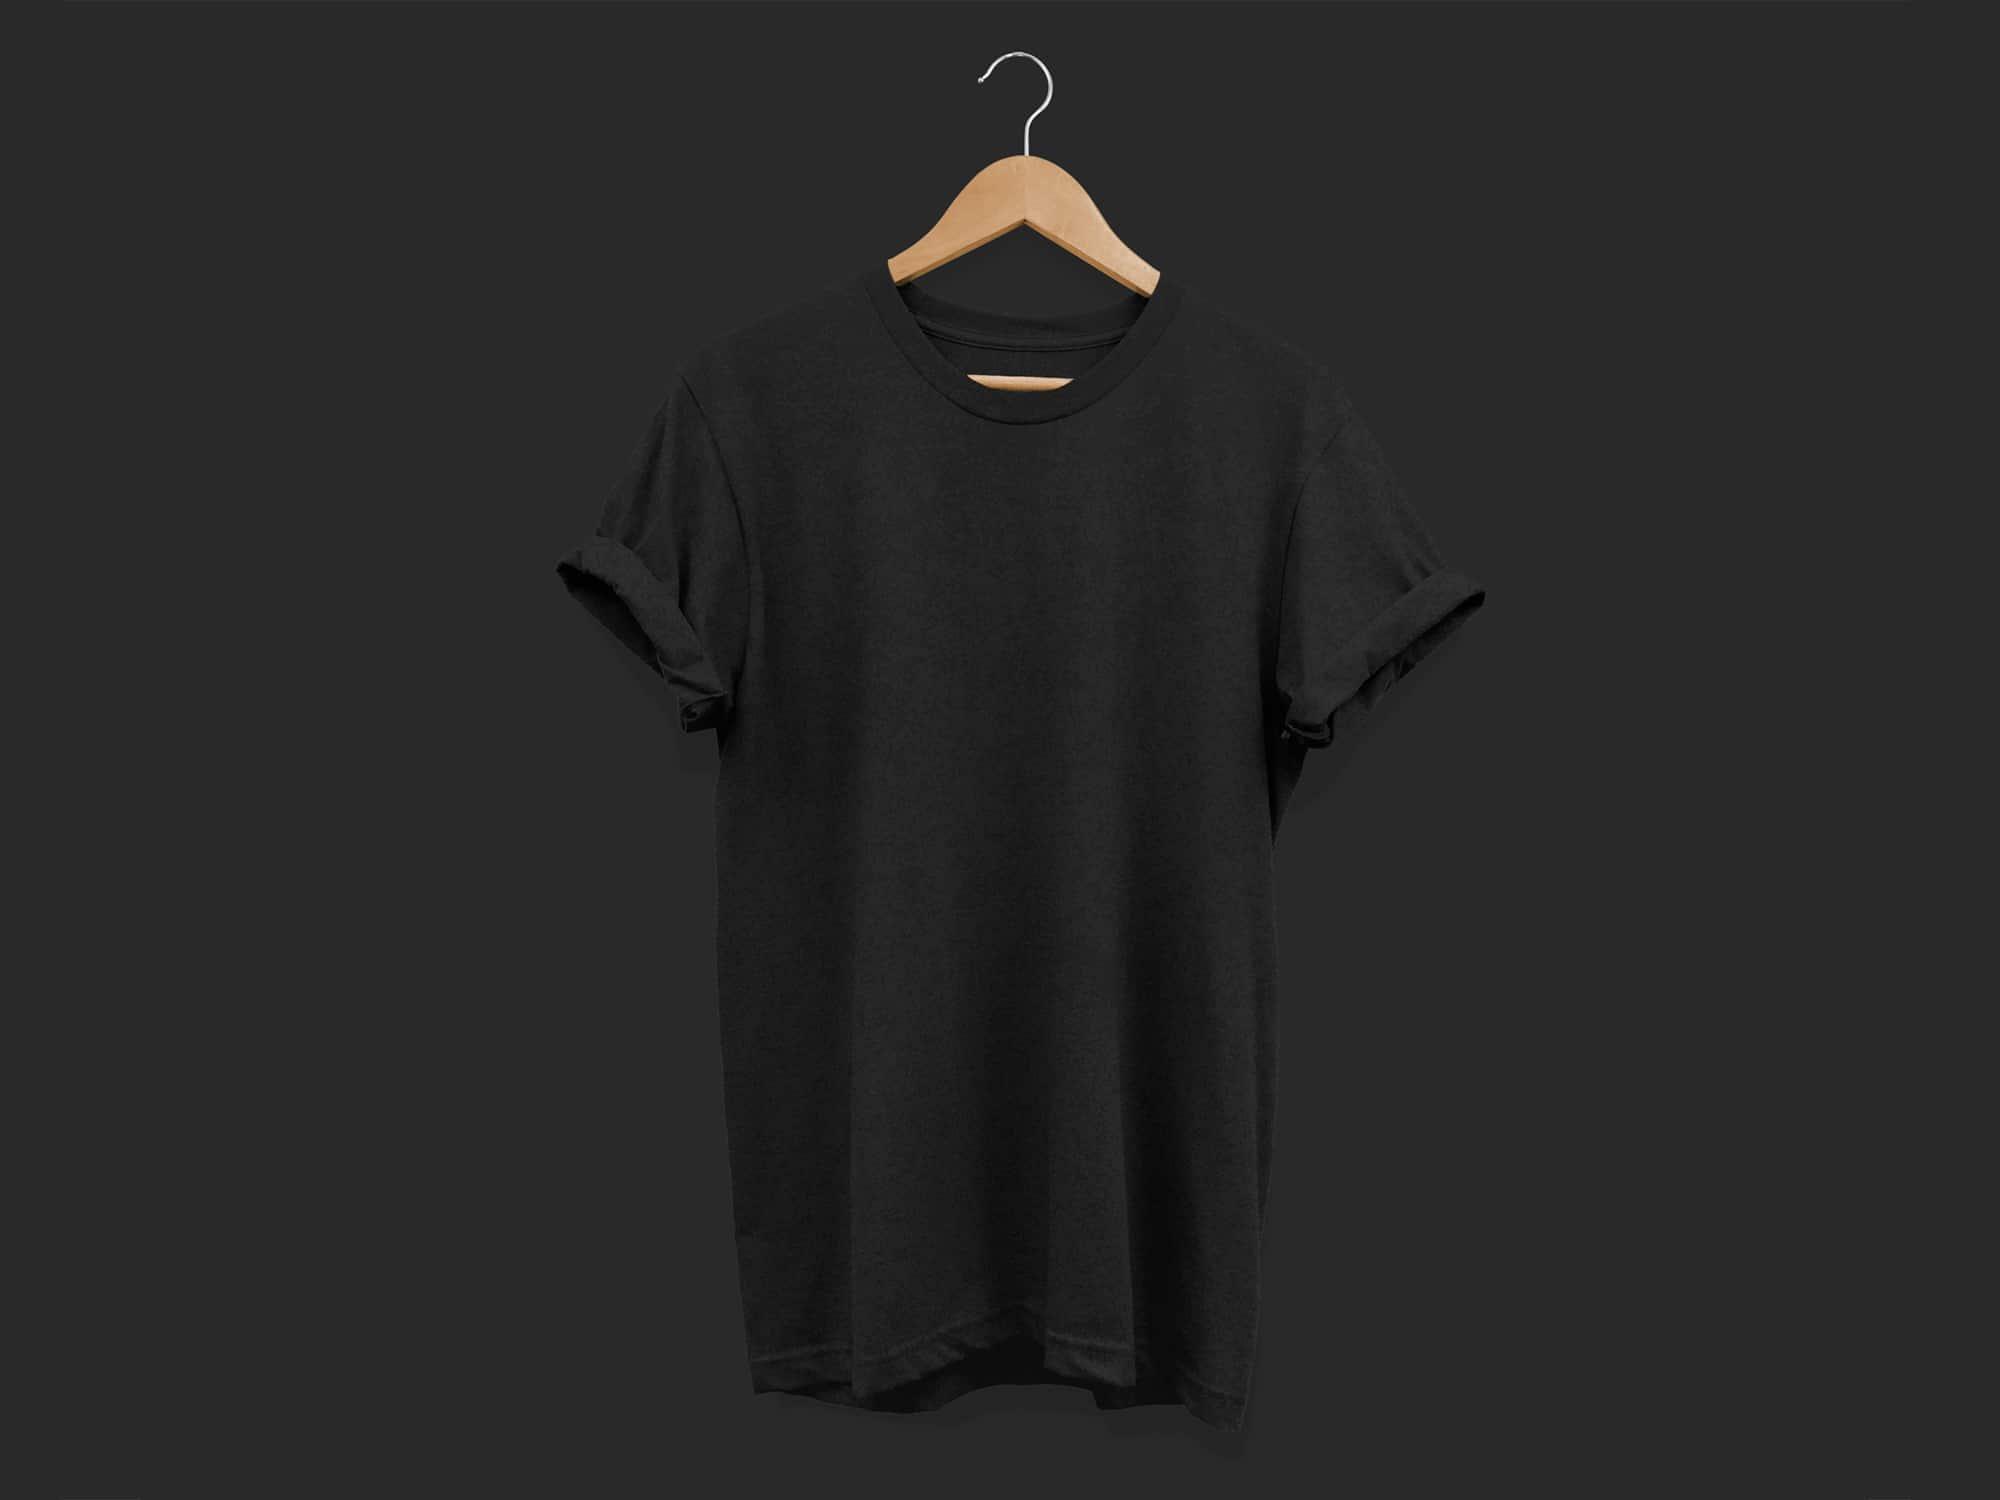 Acid Wash T Shirt Mockup The Mockup Club